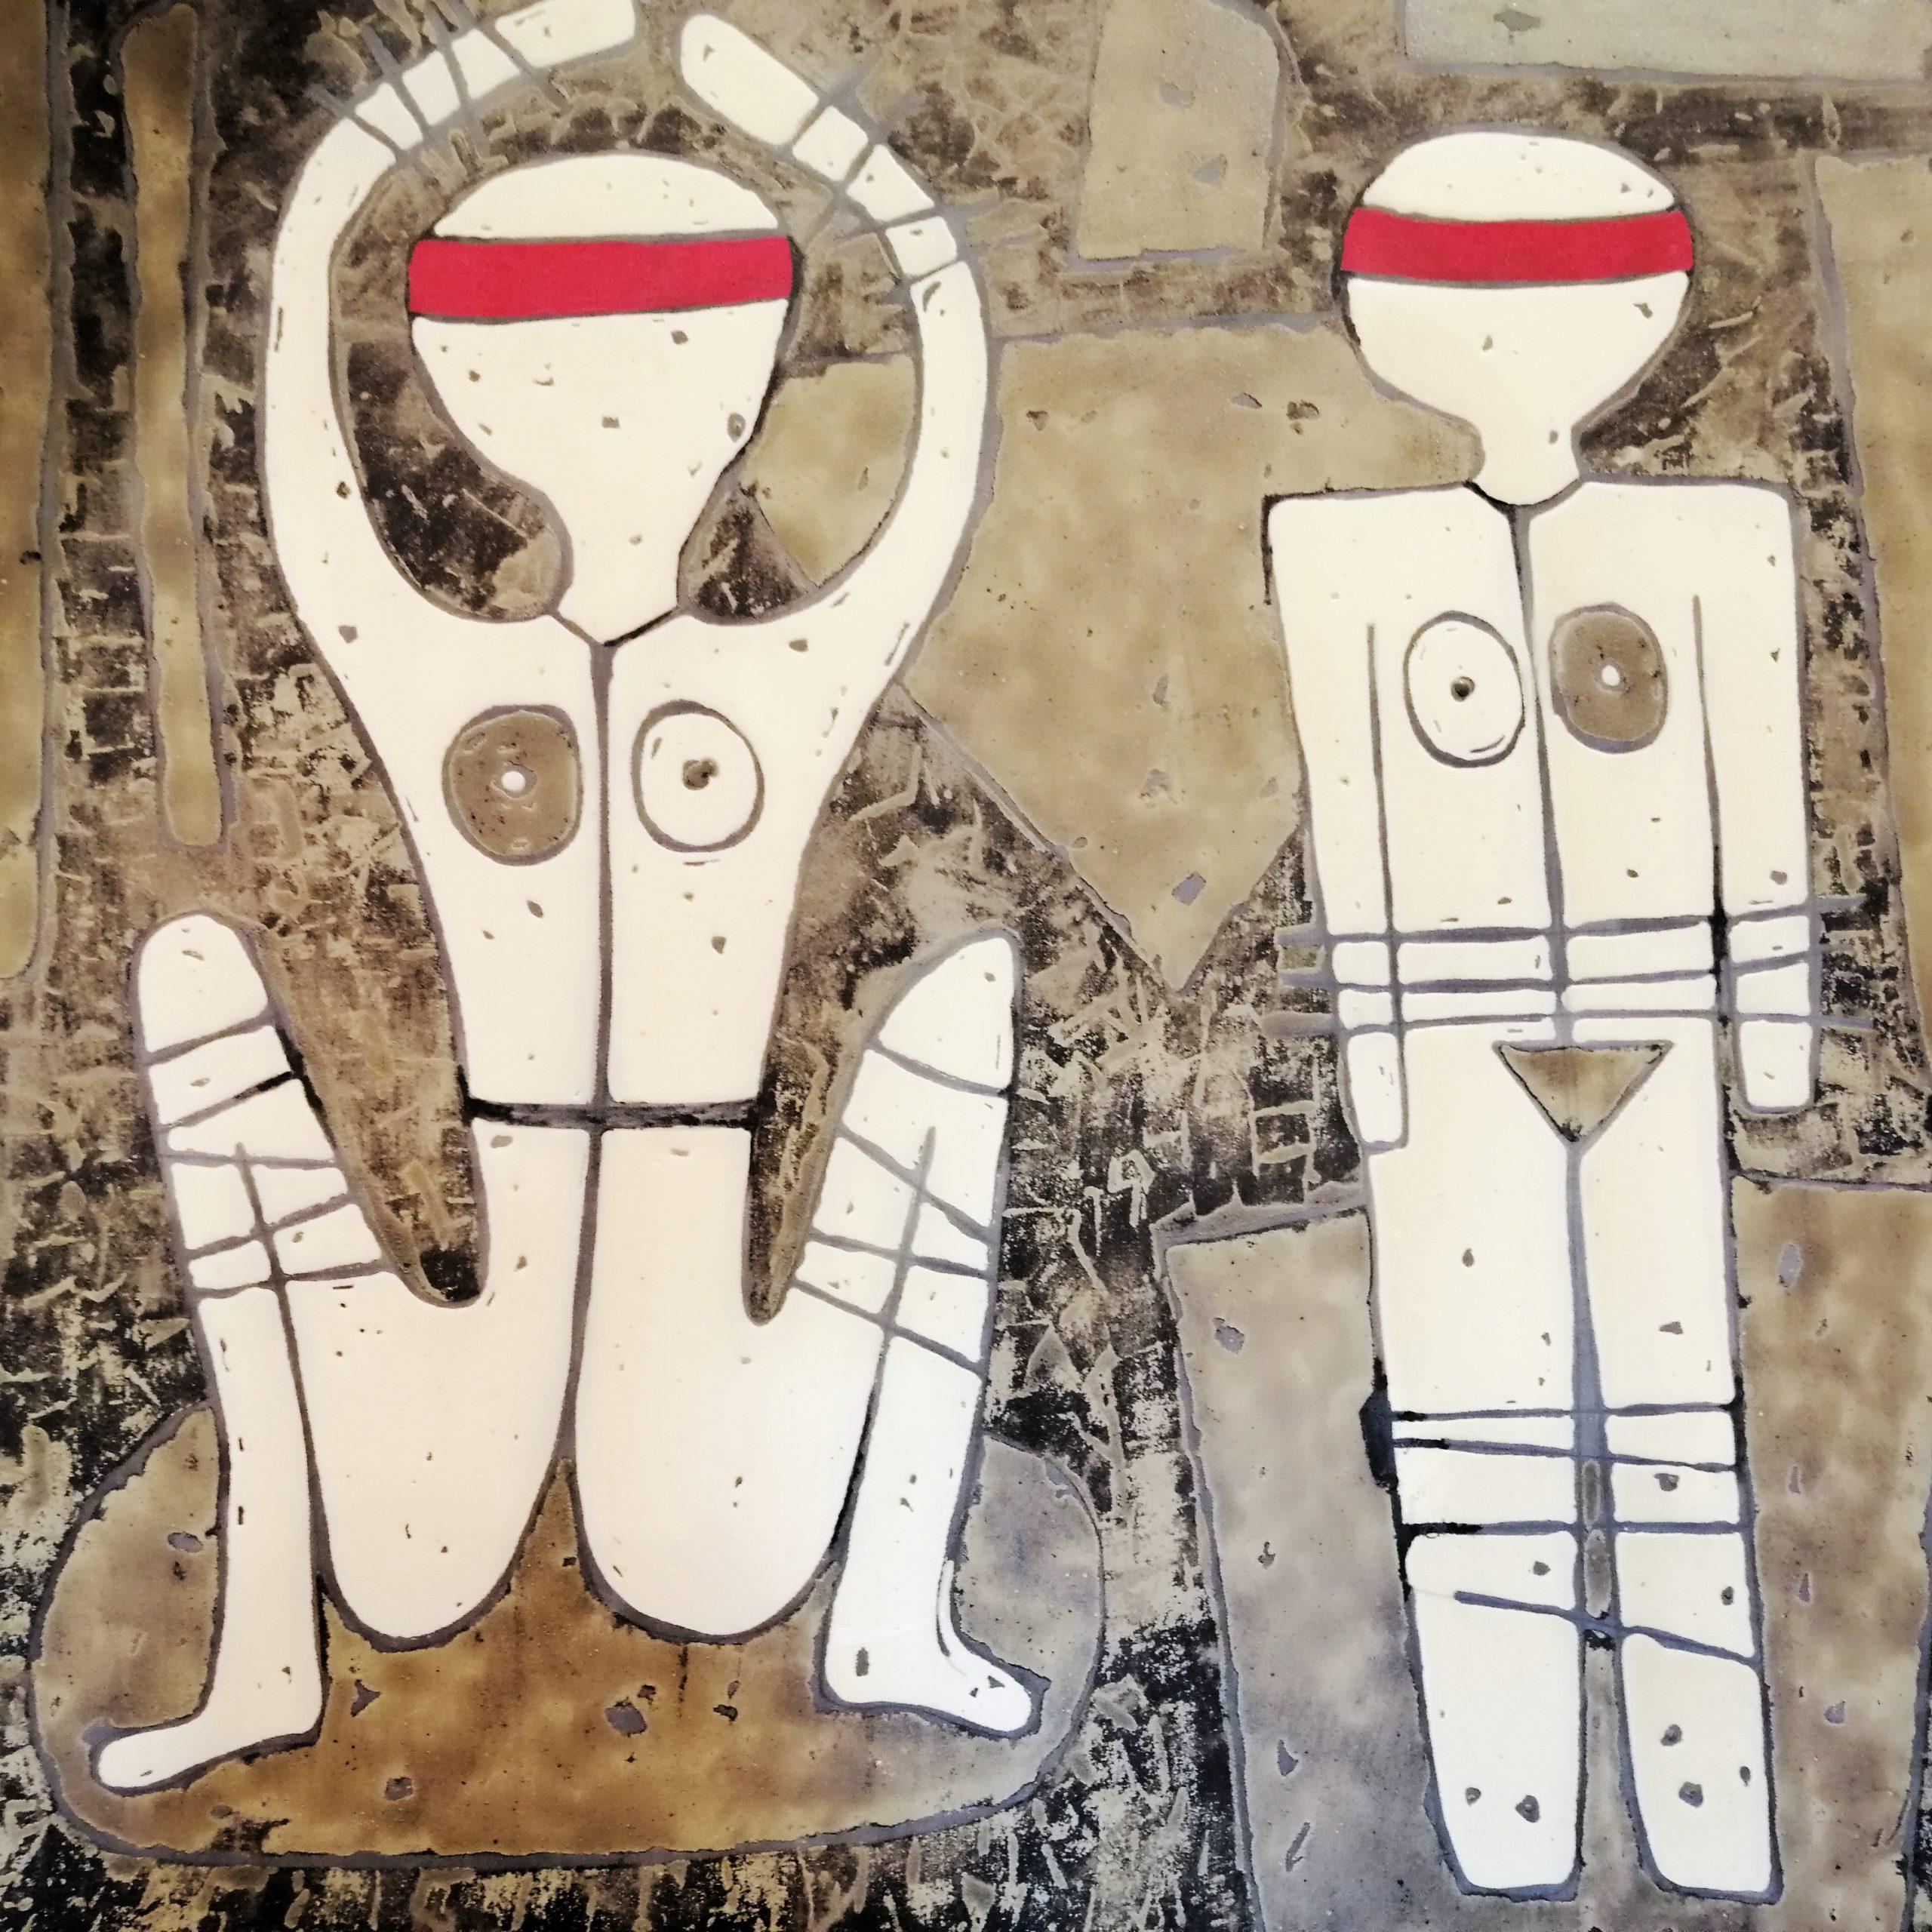 Jorge delgado - real umbria - mostra di arte cubana a Perugia